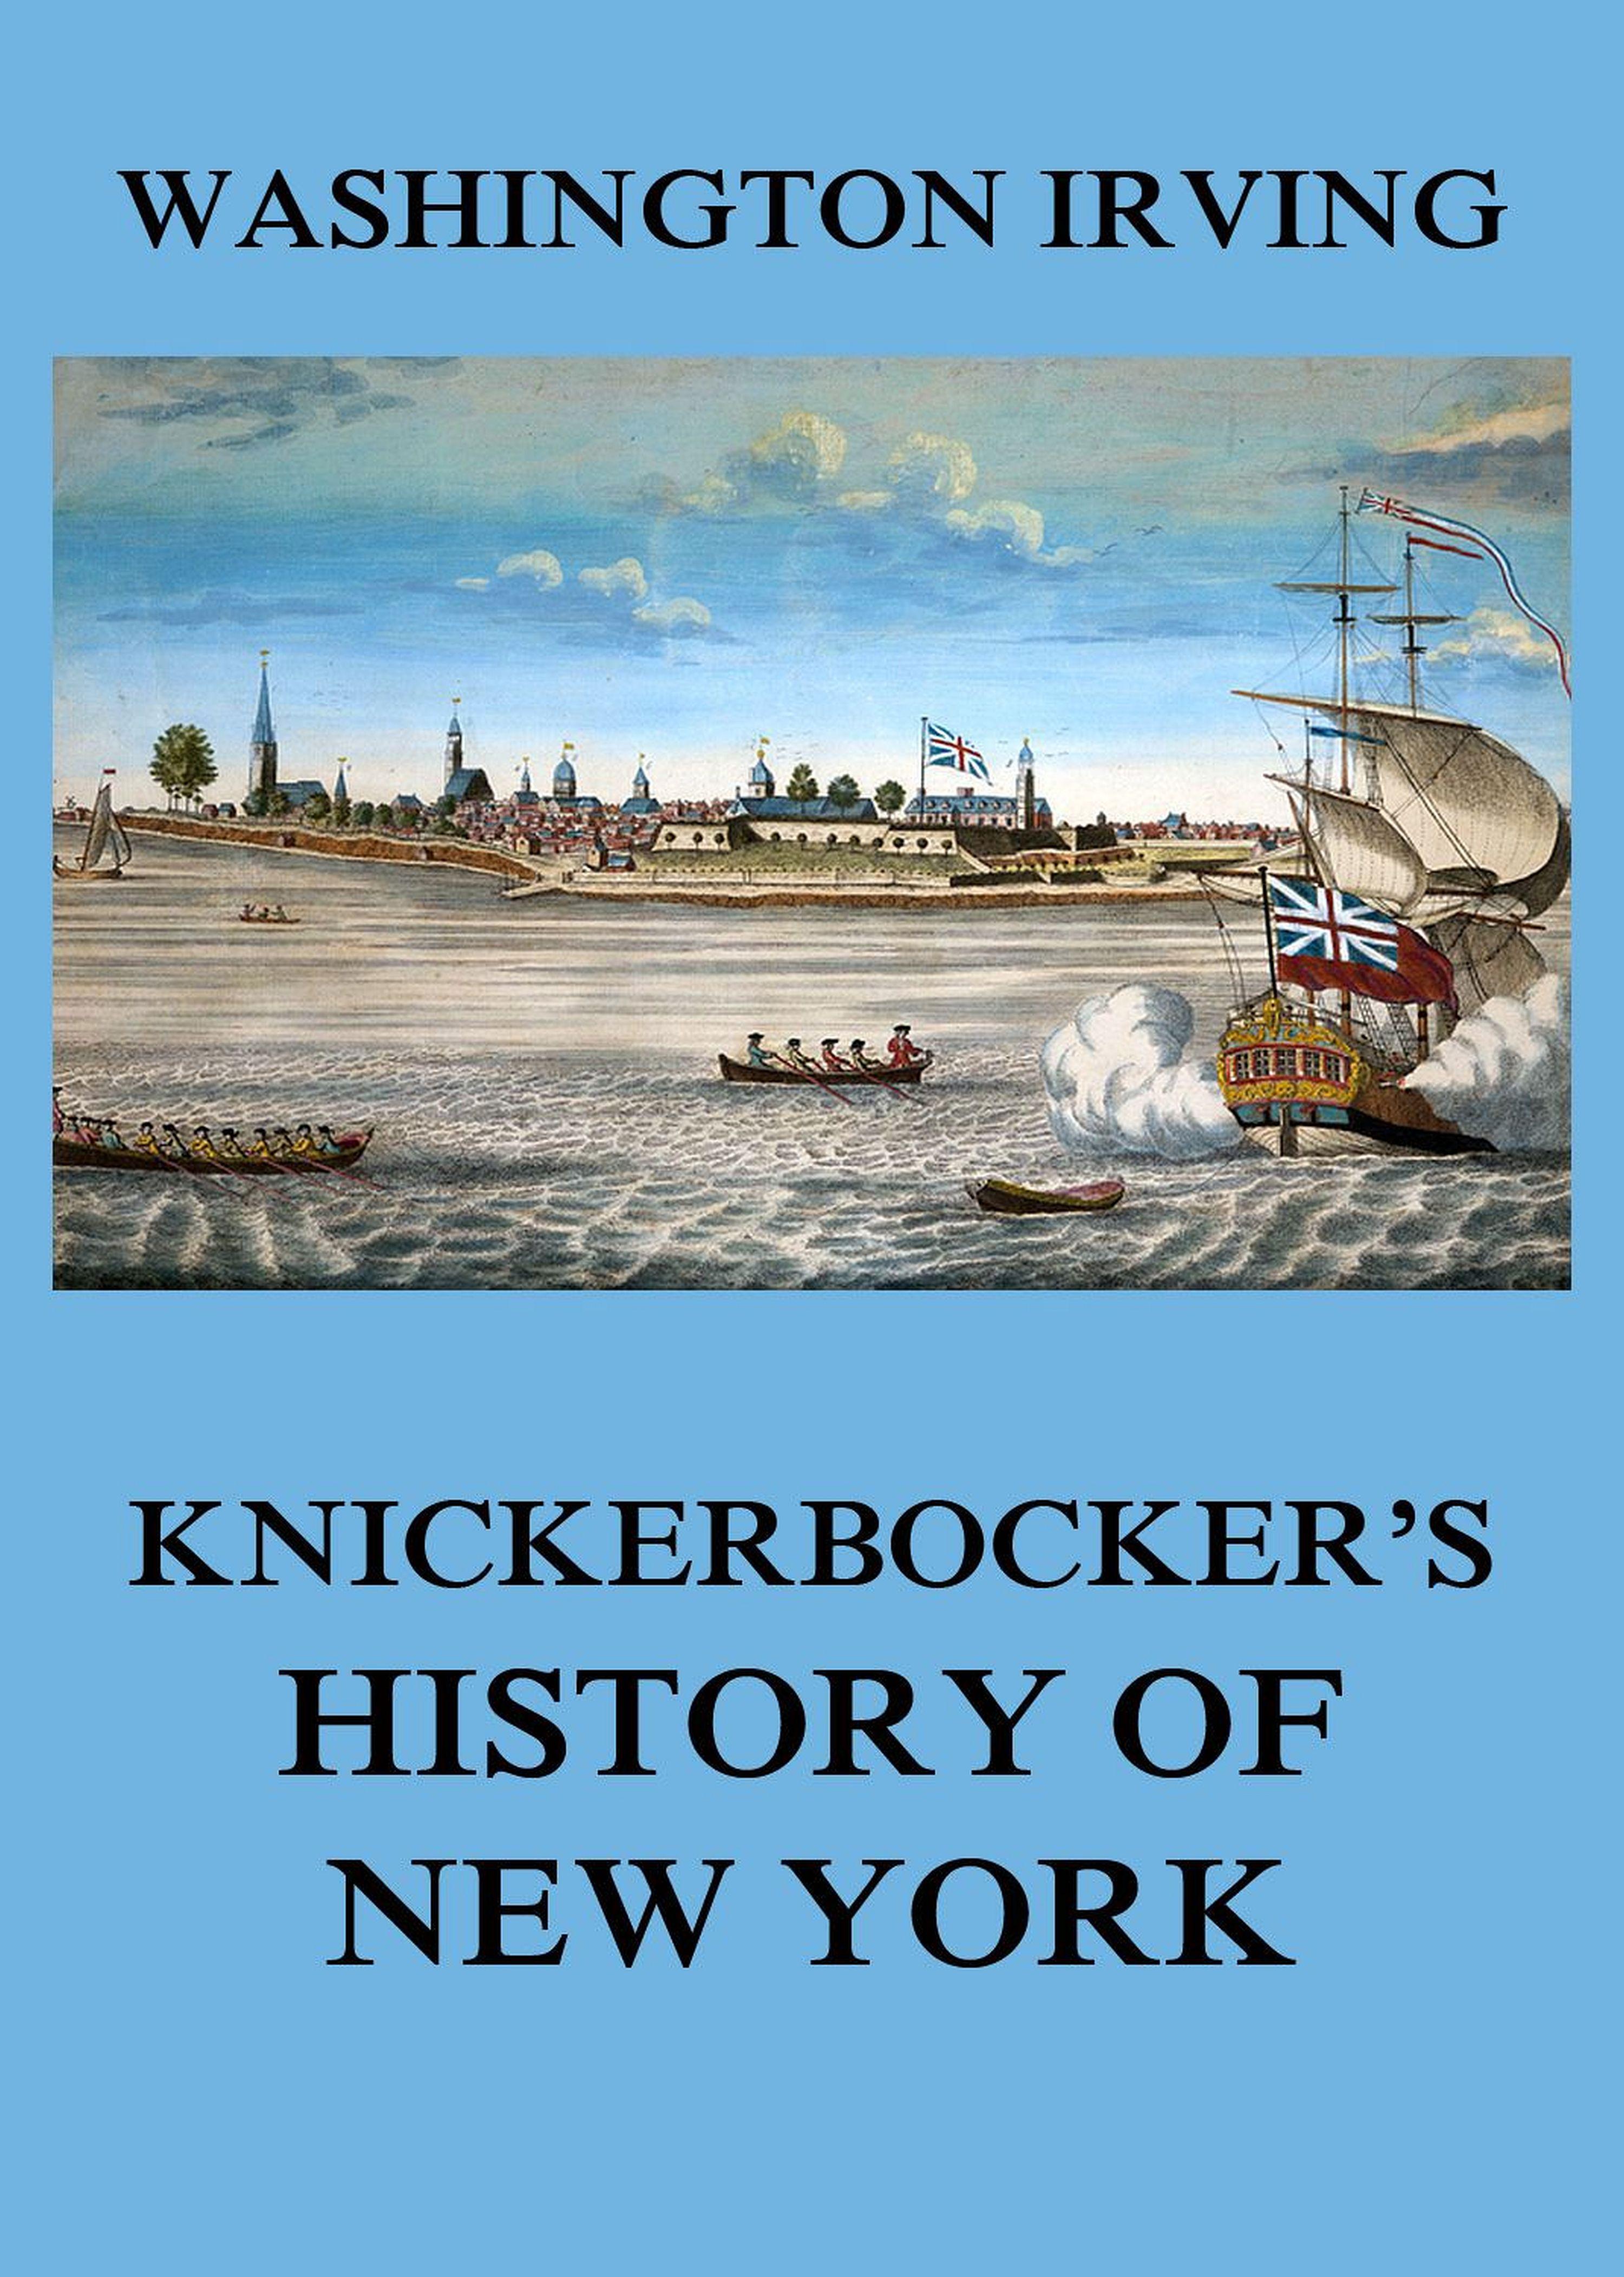 knickerbockers history of new york